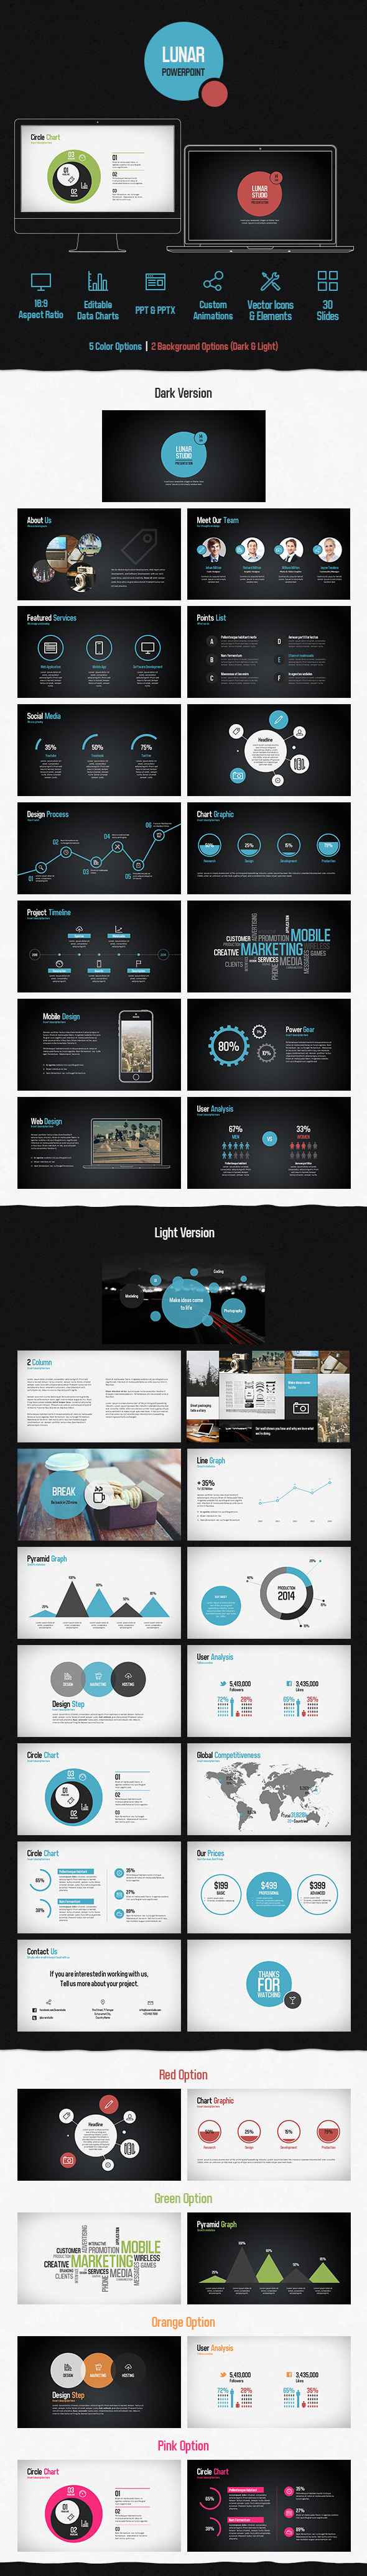 Lunar Powerpoint Presentation Template - Creative PowerPoint Templates